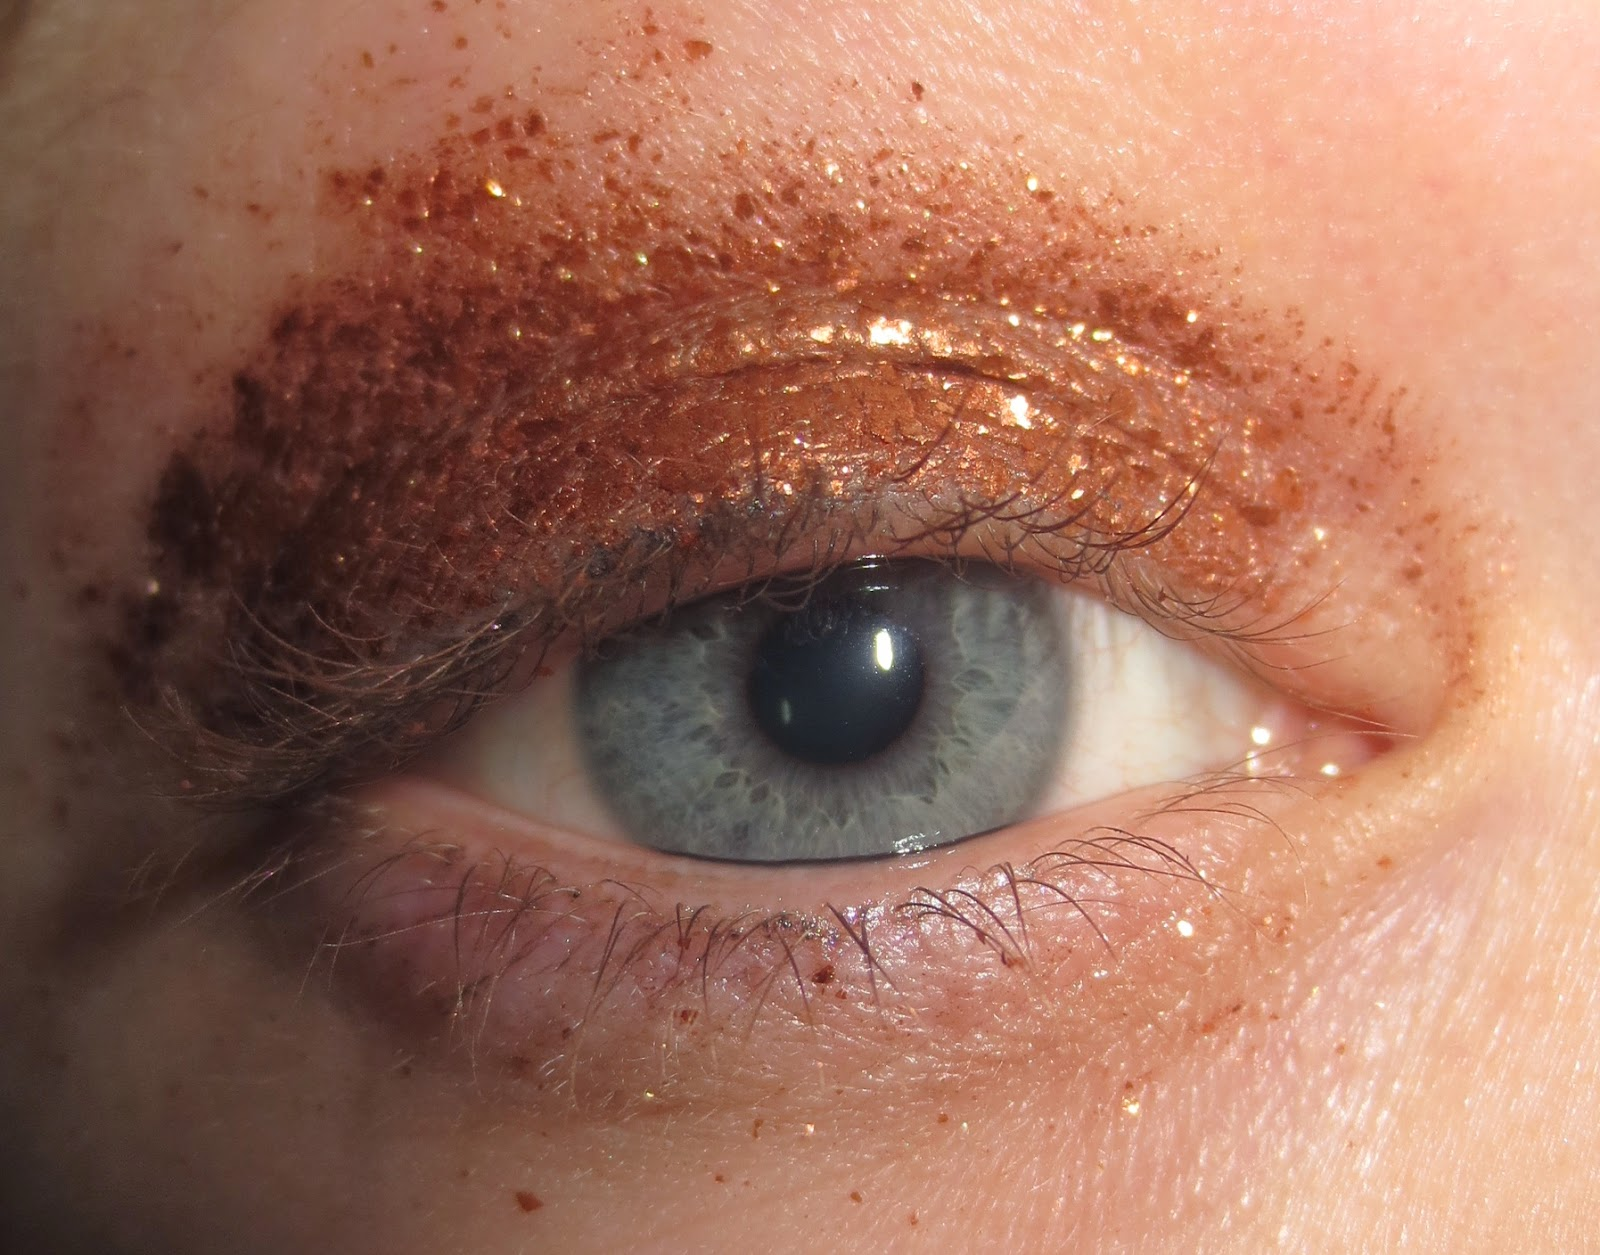 Stila Magnificent Metals Foil Finish Eye Shadow - Comex Copper